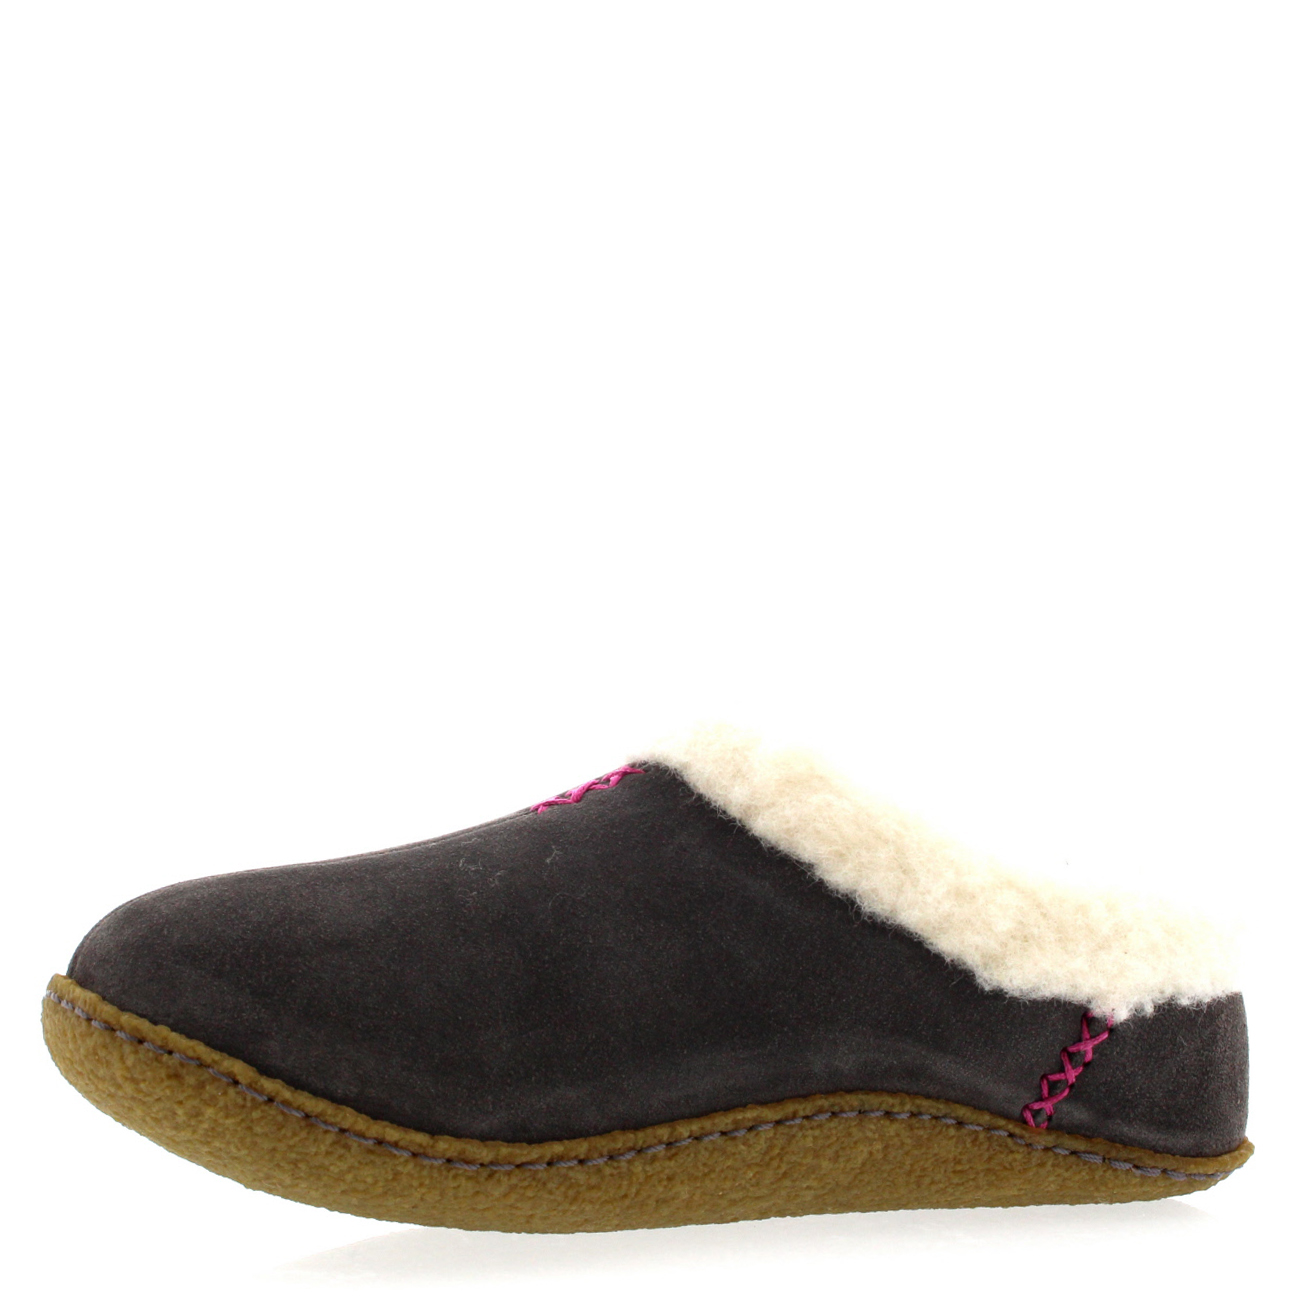 Donna Sorel Nakiska Winter Fur Lined Warm UK Suede House Shoes Slippers UK Warm 3-9 f0e4c2